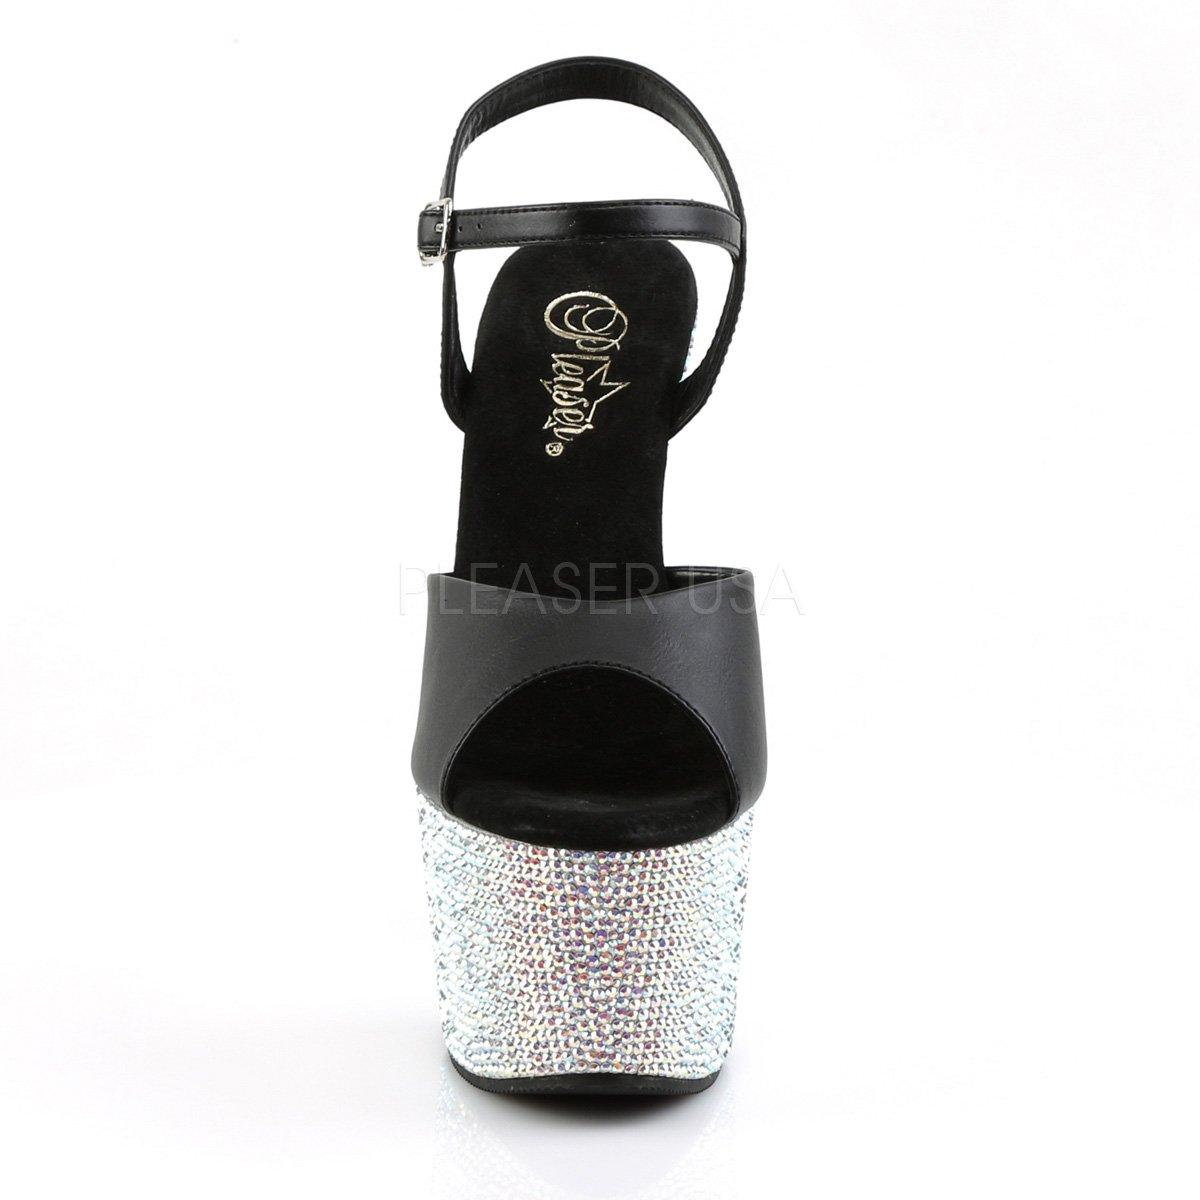 Pleaser Women's Bejeweled-709DM/BS/PWRS Ankle-Strap US|Blk Sandal B00ZQX50EC 5 B(M) US|Blk Ankle-Strap Faux Leather/Slv Multi Rs f7d164